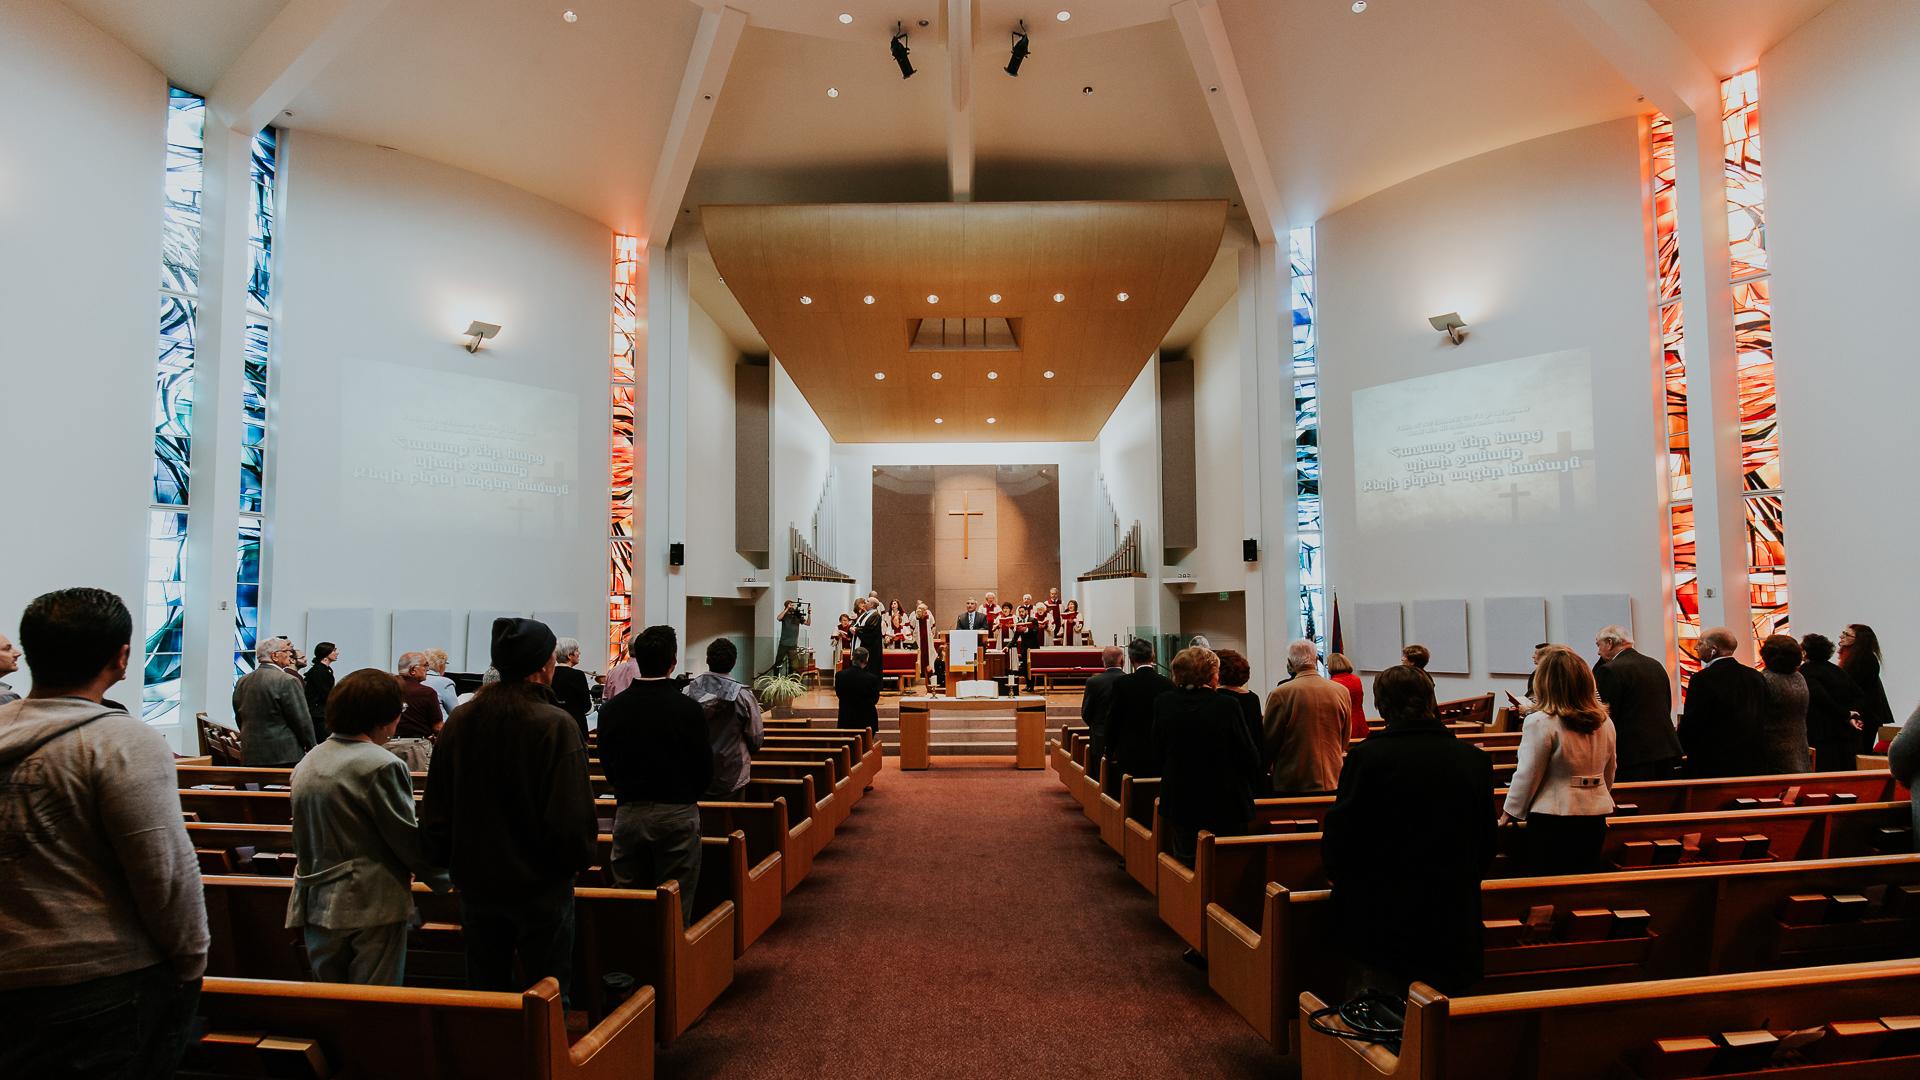 UACC Worship Service